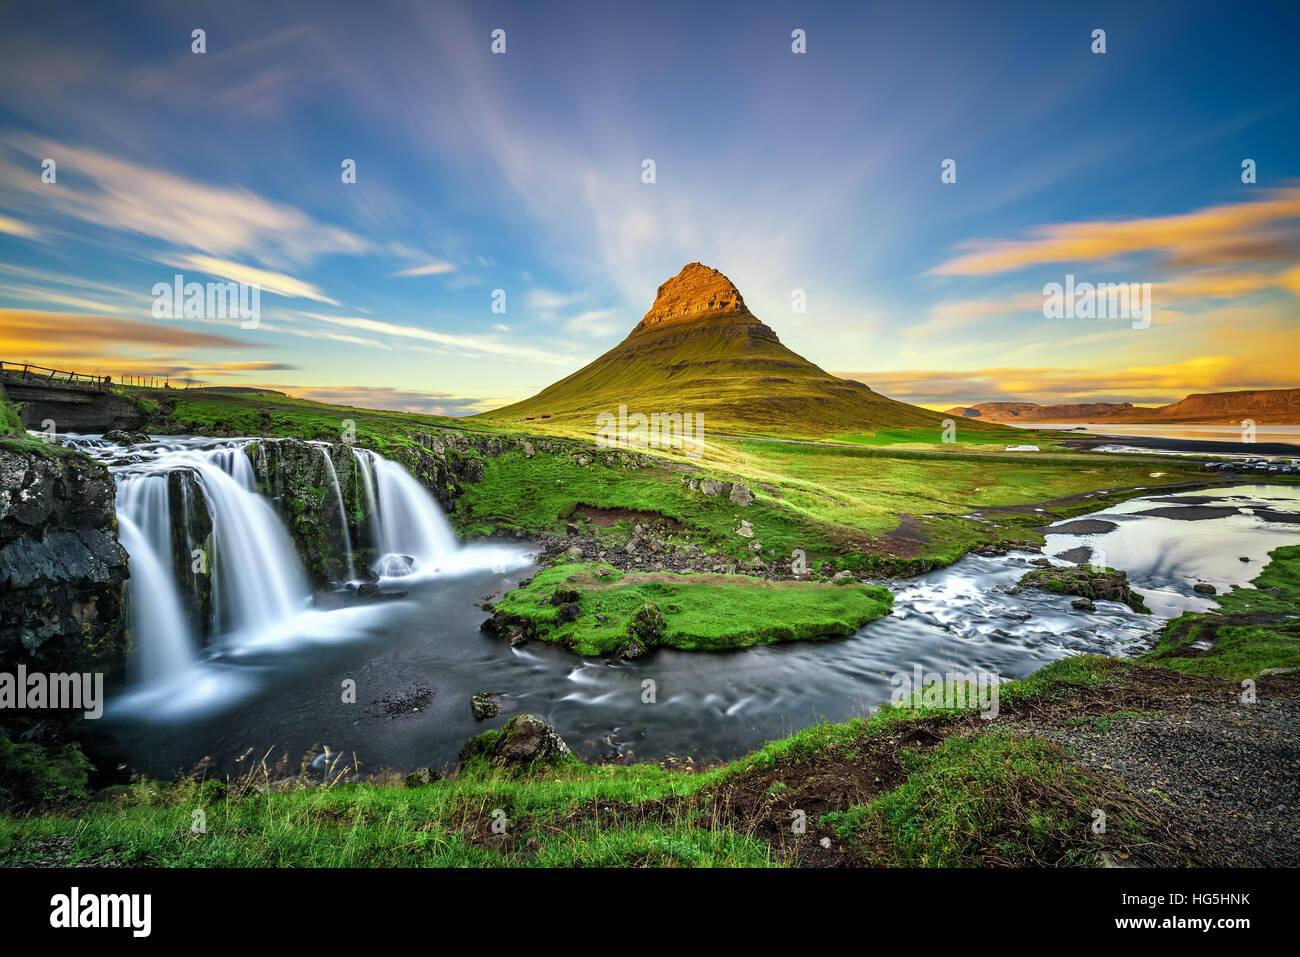 Sommer Sonnenuntergang über den berühmten Kirkjufellsfoss-Wasserfall mit Kirkjufell Berg im Hintergrund Stockbild